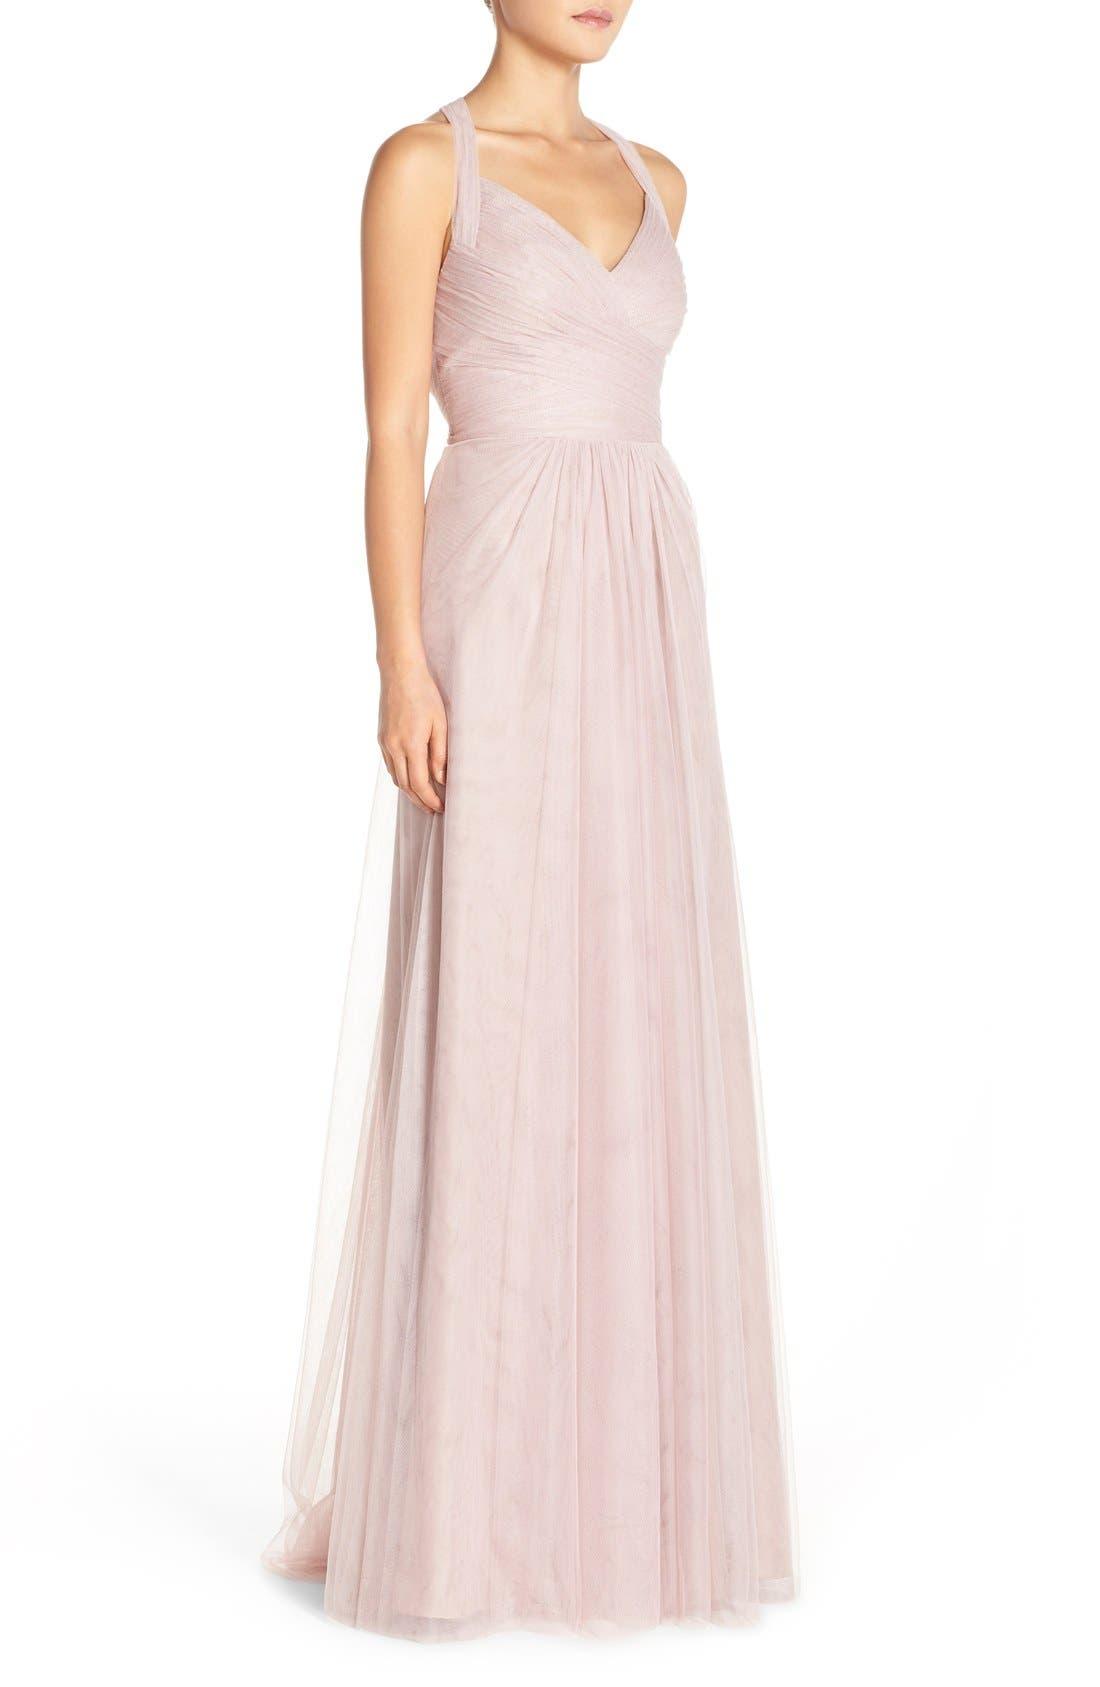 Alternate Image 3  - Monique Lhuillier Bridesmaids Sleeveless V-Neck Tulle Gown